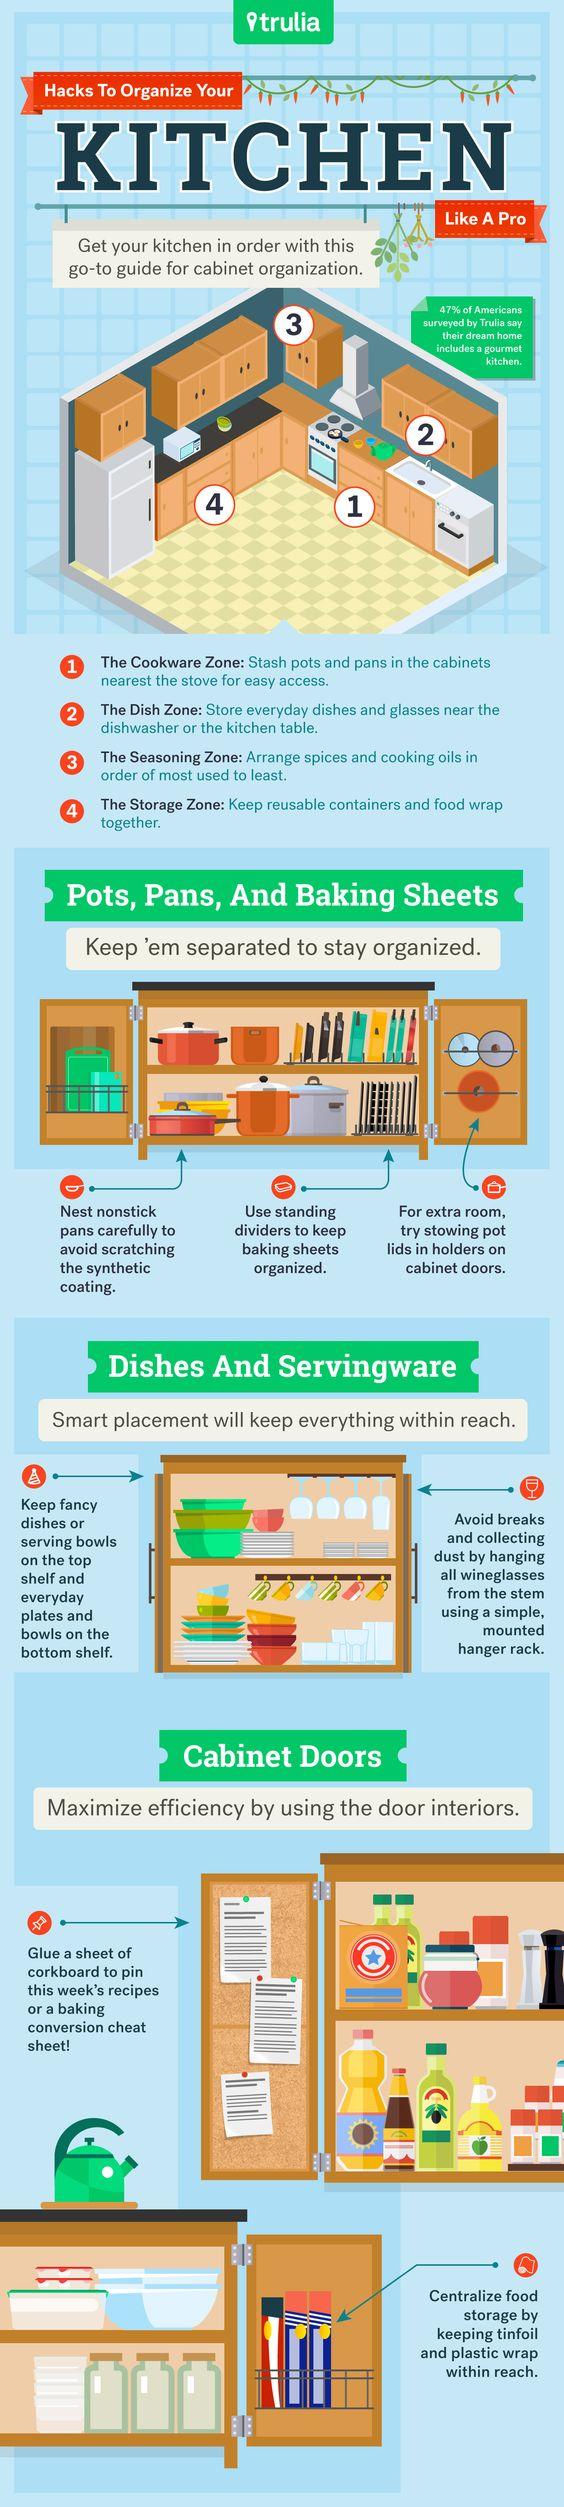 8 Beyond Easy Kitchen Organization Hacks